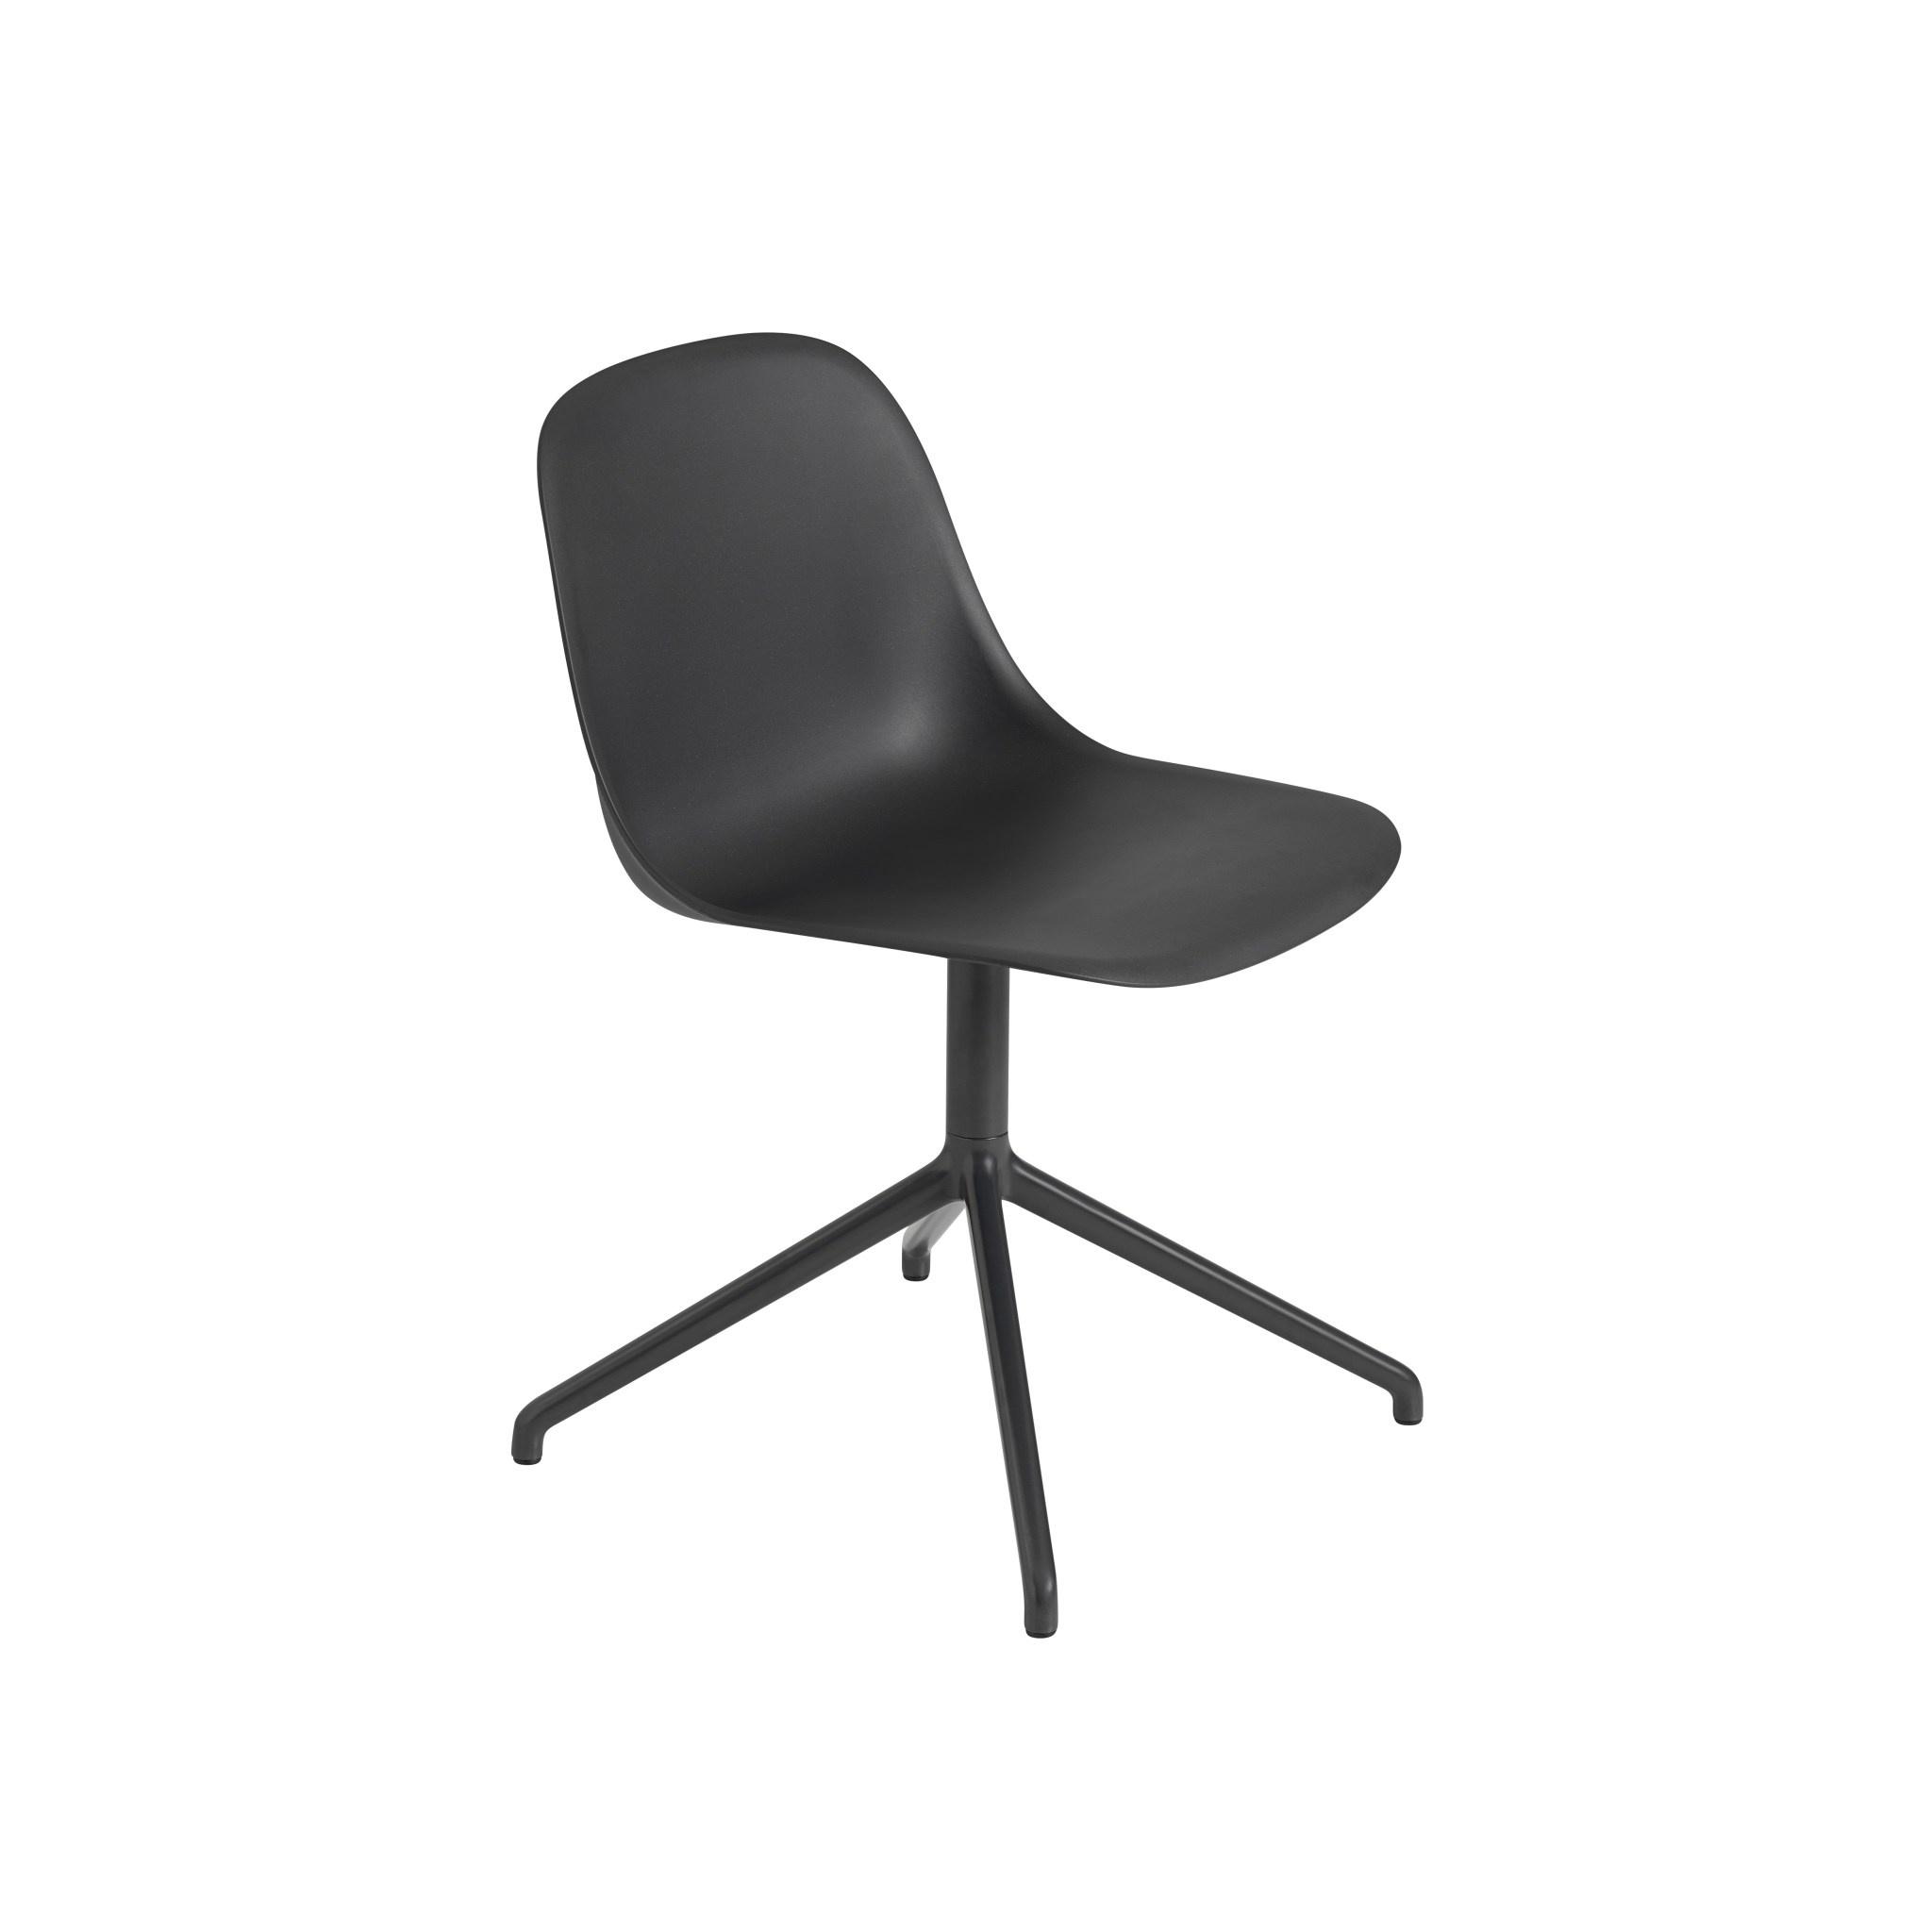 Fiber side chair swivel base w.o. return-3